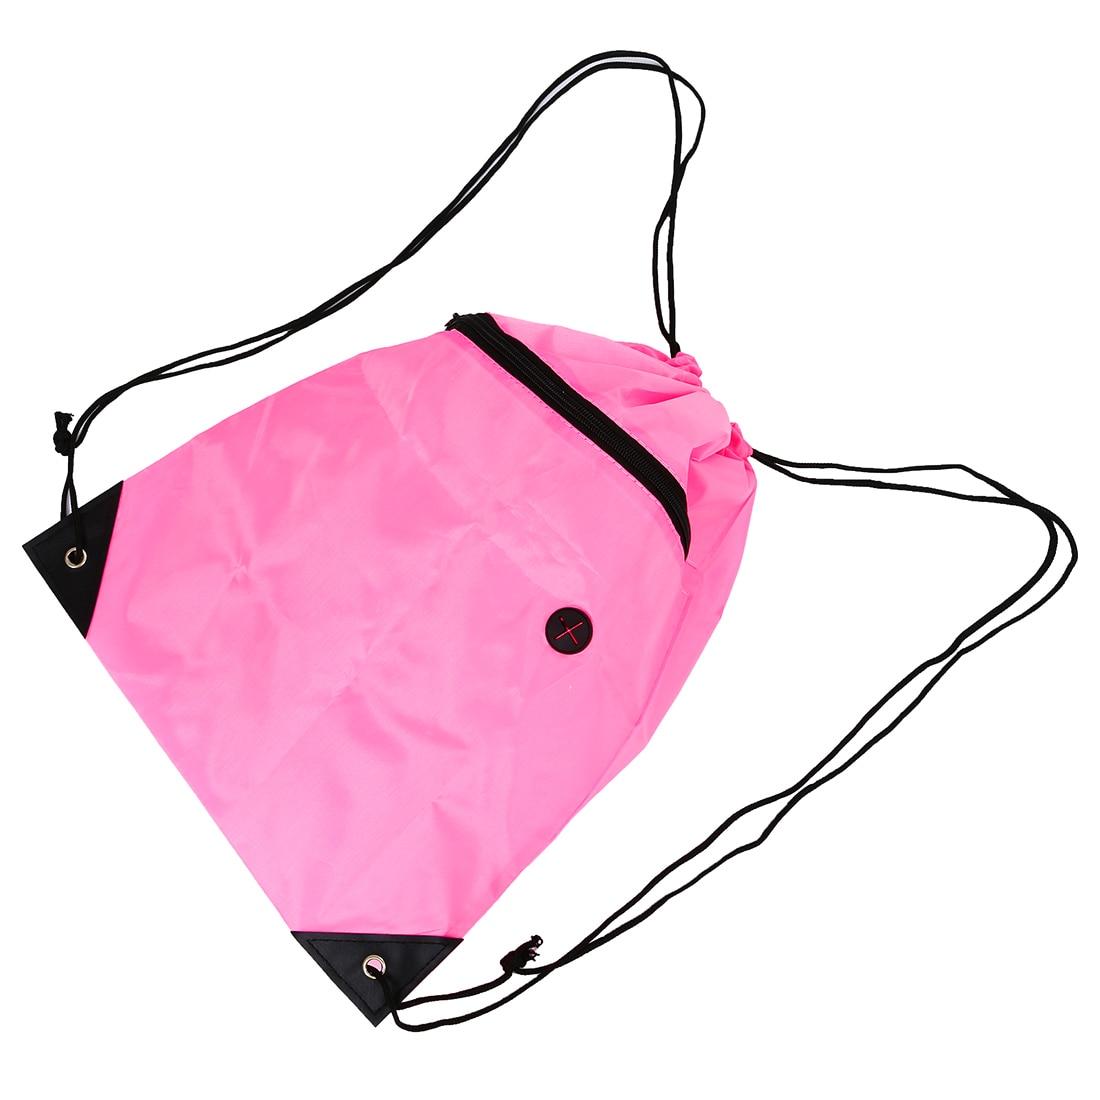 Book bag with cord PE shoe backpackBook bag with cord PE shoe backpack